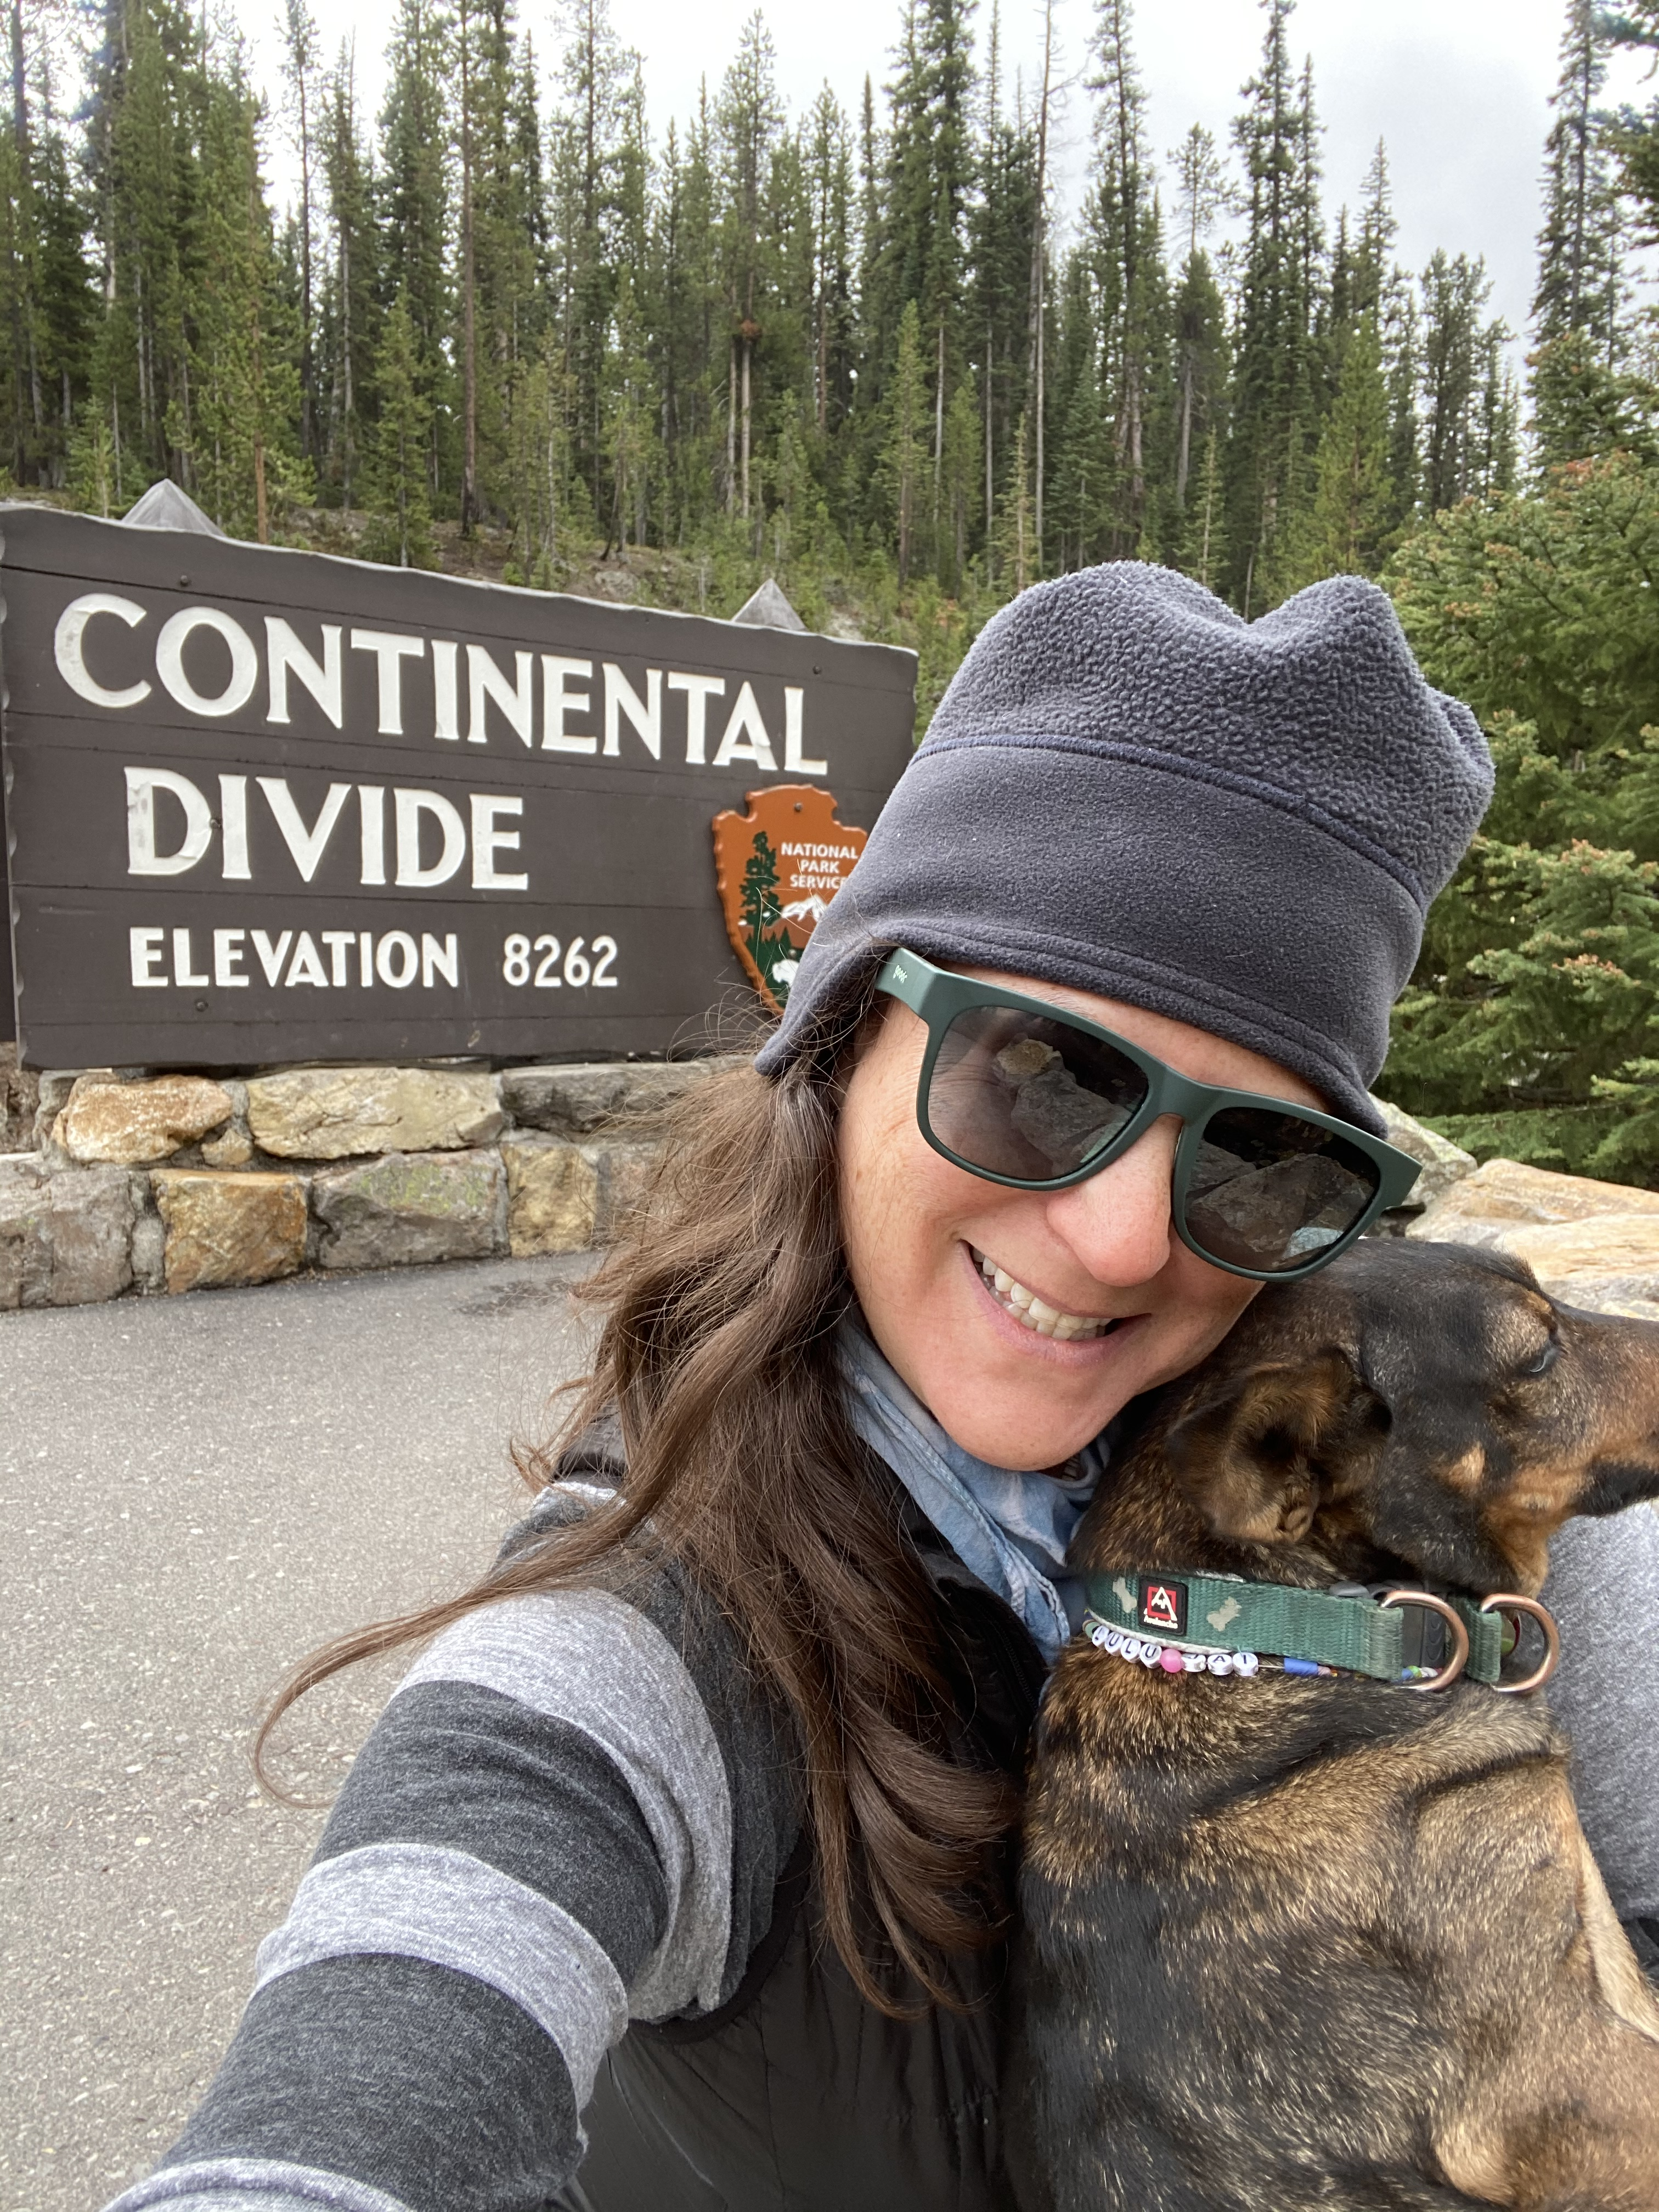 Justine Fanarof yoga teacher yoga nidra meditation law ethics social justice activism breath breathe lulu-jai #fanarofing yellowstone national park